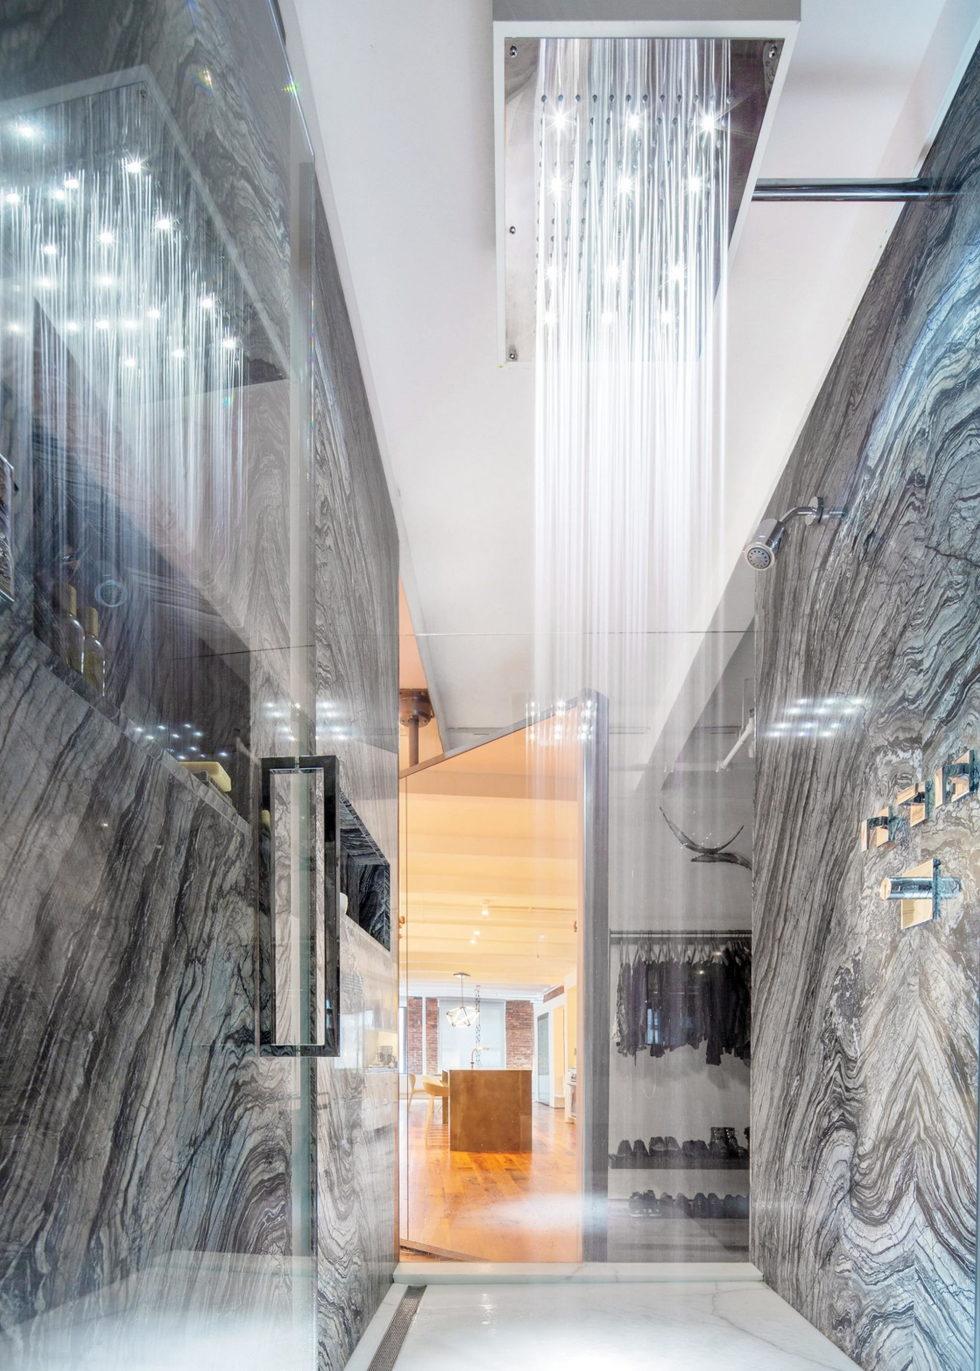 Chelsea The Designers Loft At Manhattan 4